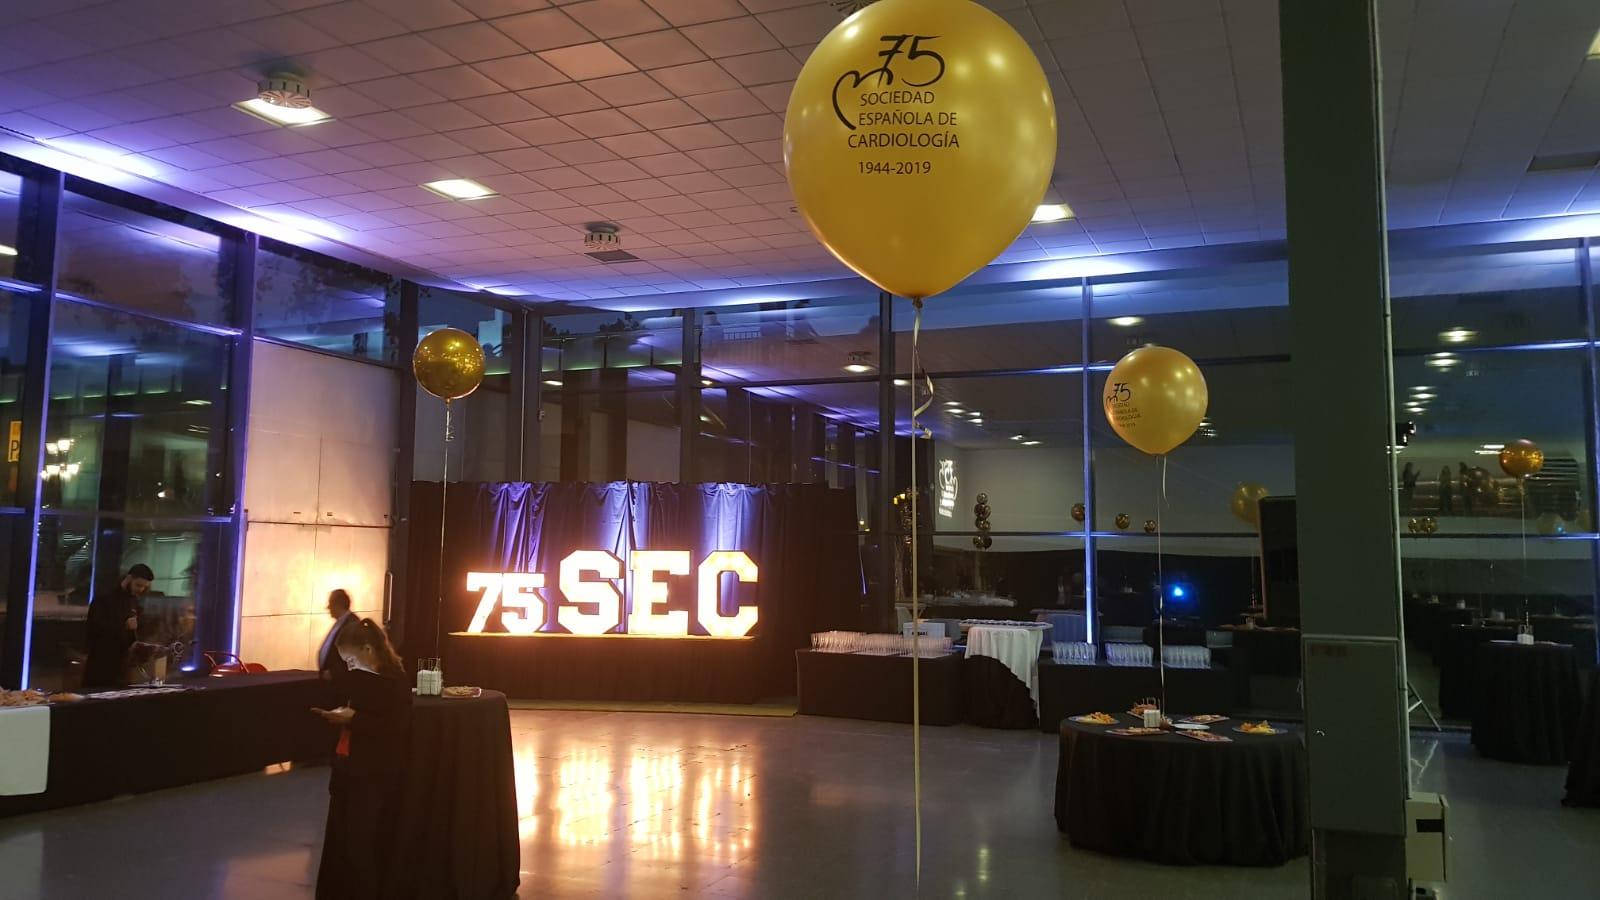 75 aniversario SEC en la Fira de Montjuic